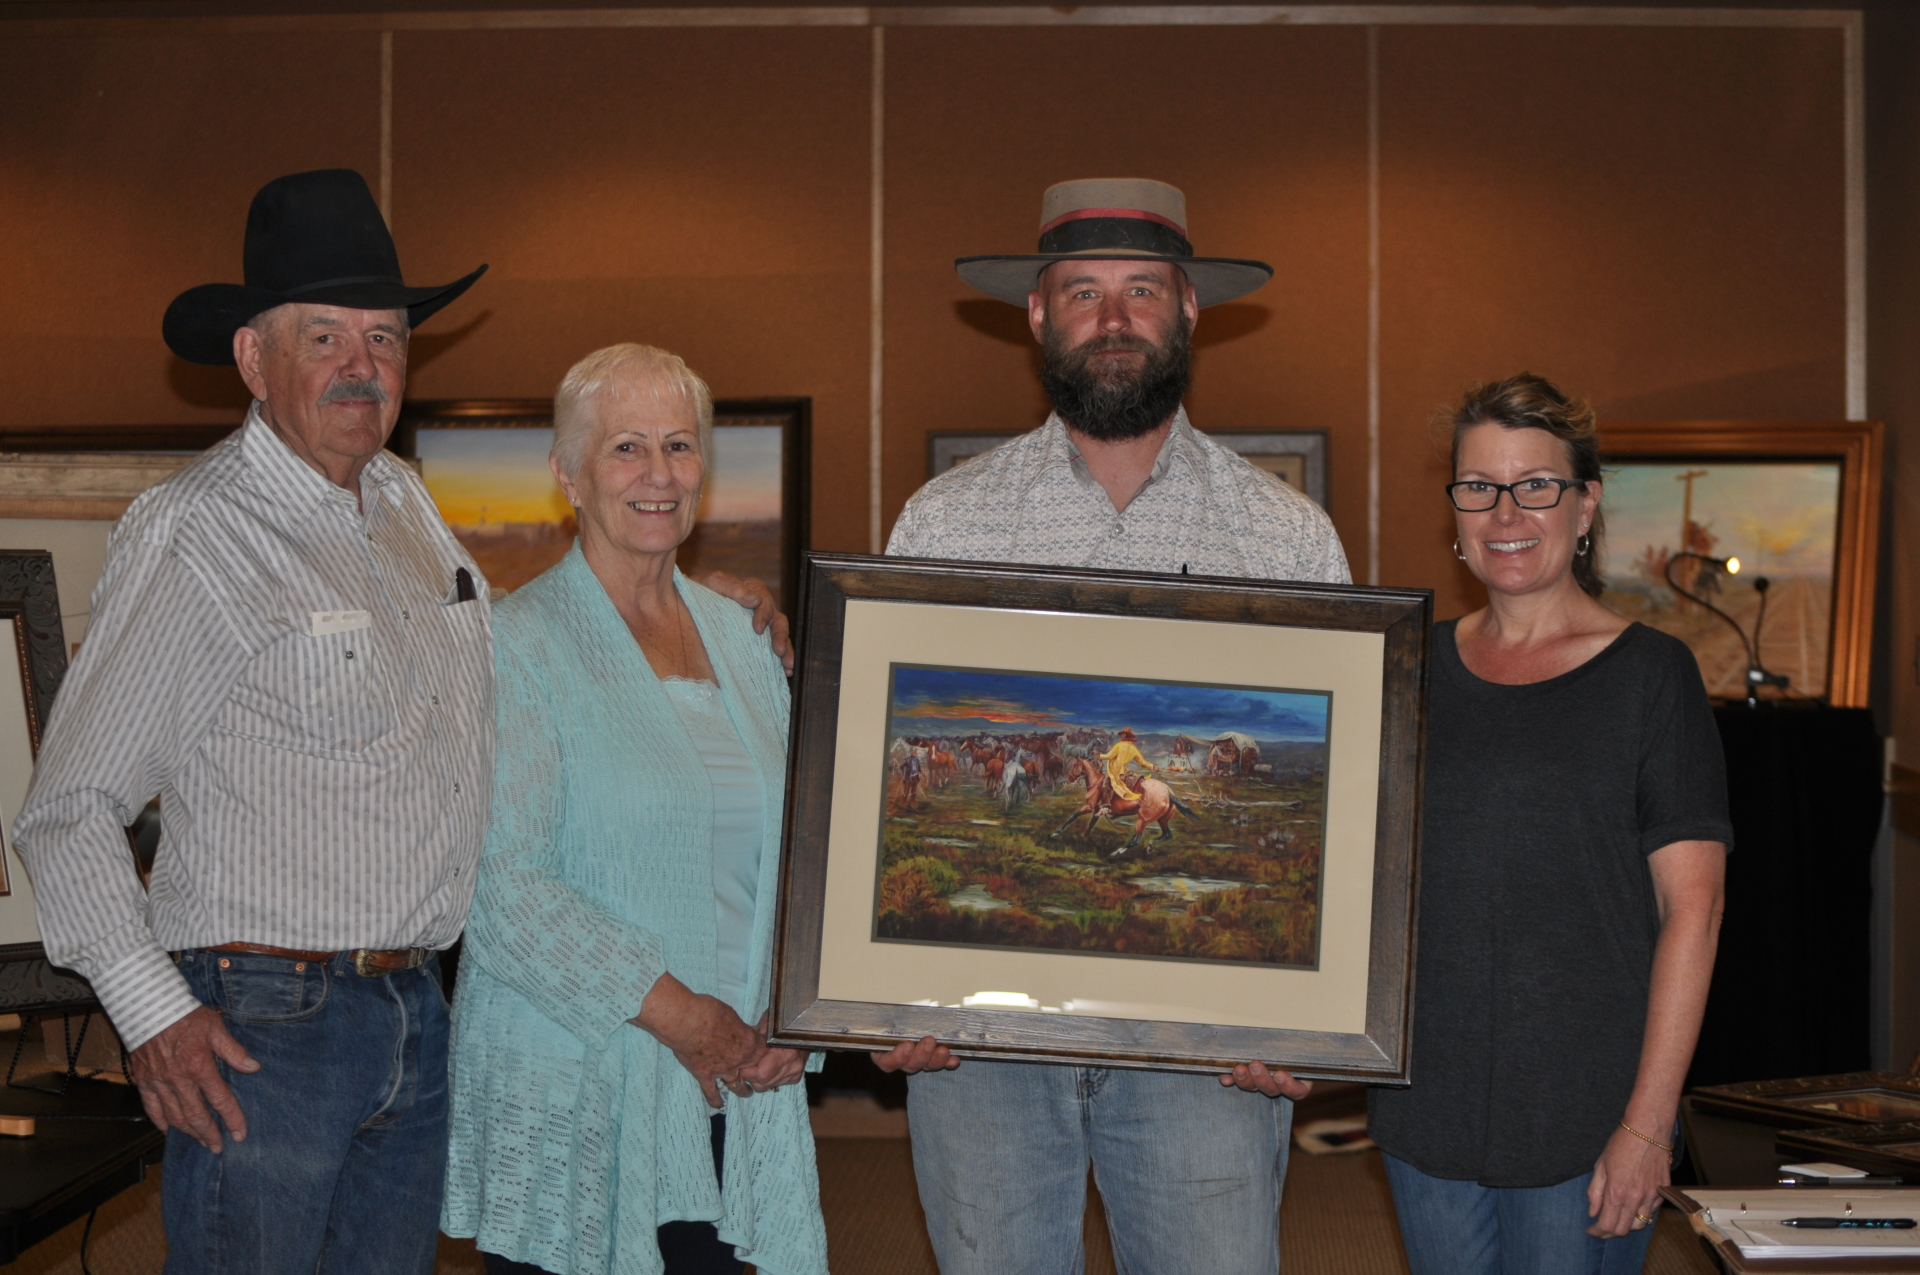 Bringing in the Remuda, Western Art, Len Babb Western Art, Charles M Russel, Old west history, buckaroo, cowboy art